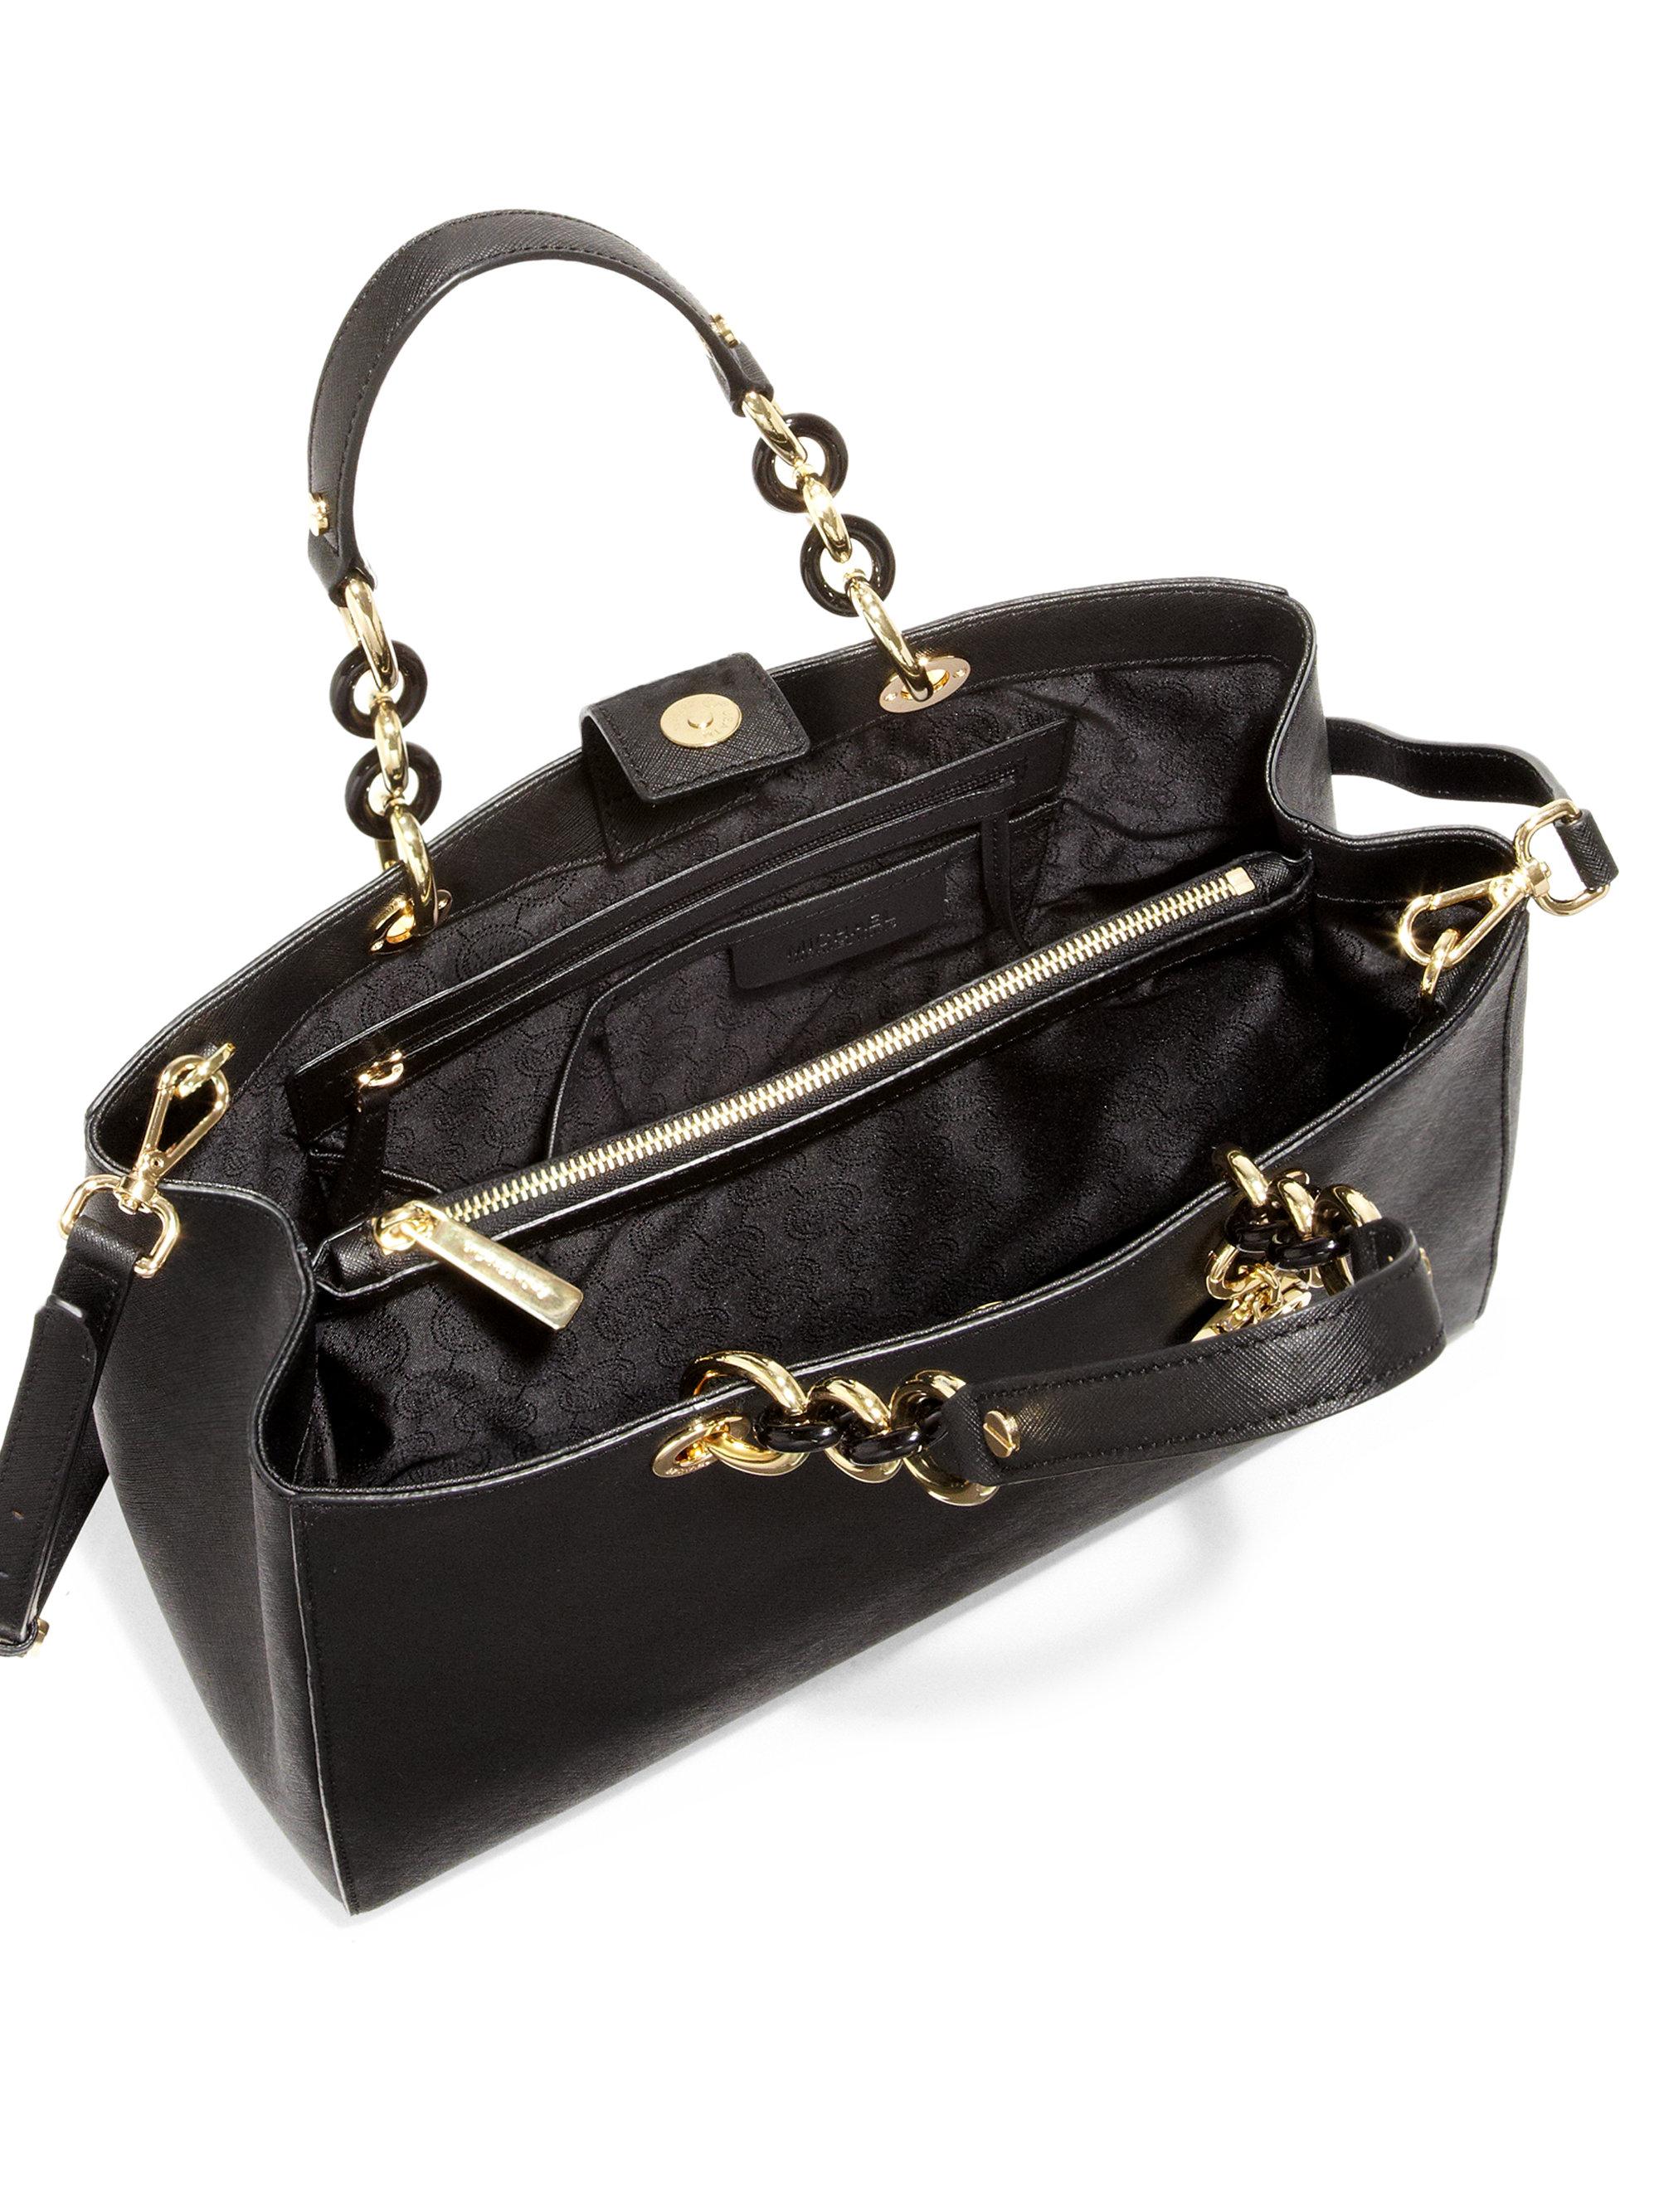 7f809d2f4452 ... low price lyst michael michael kors cynthia large satchel in black  96212 51000